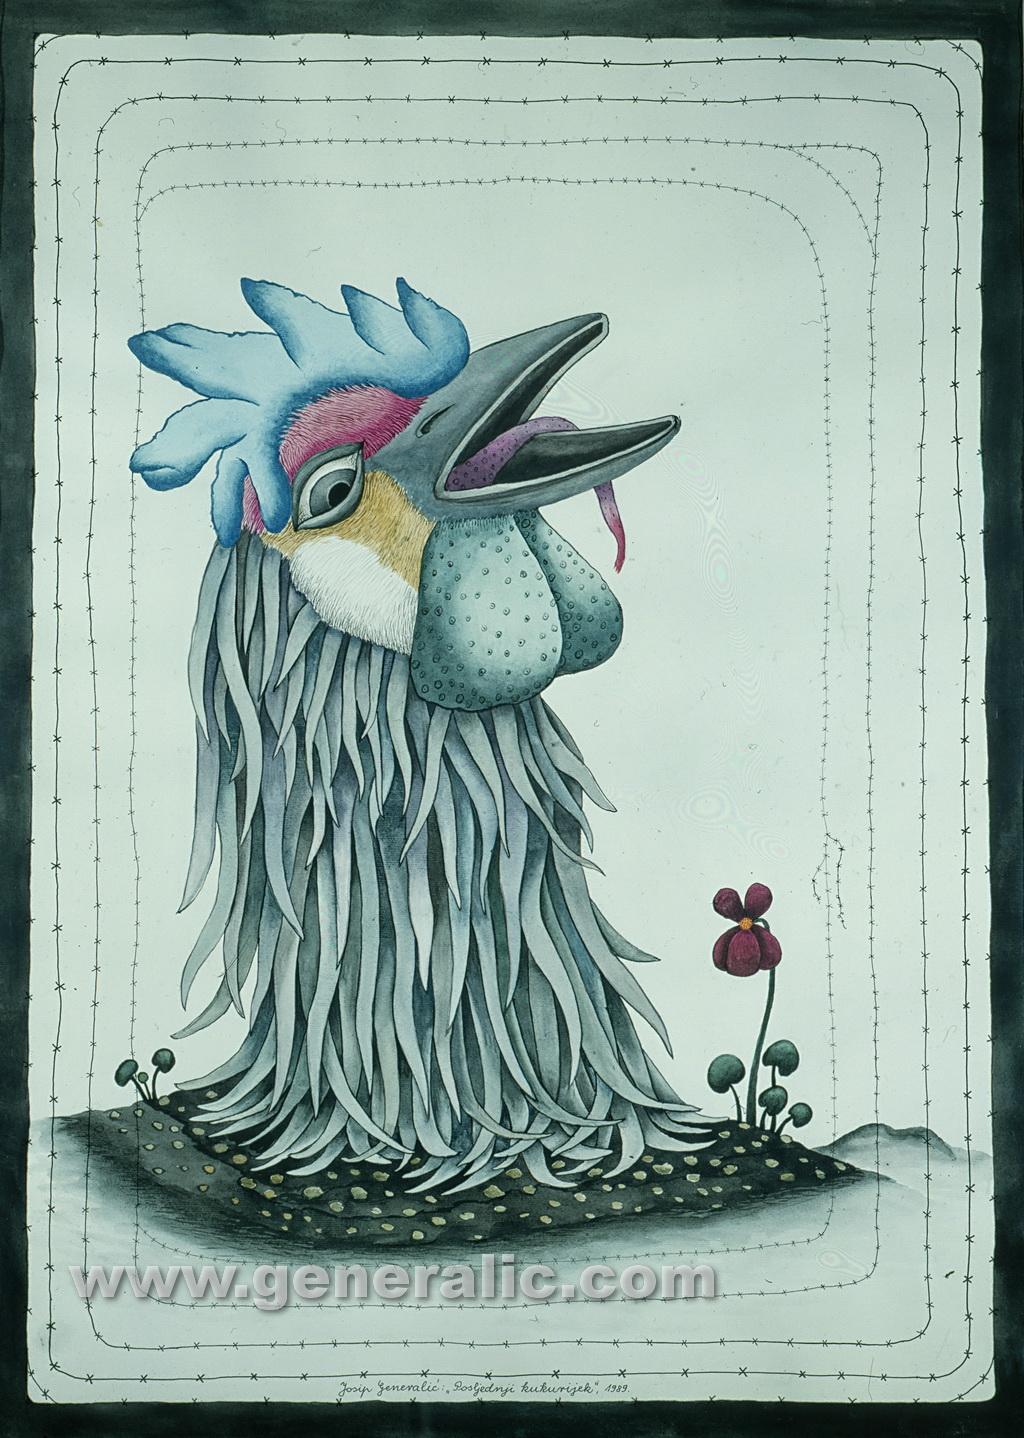 Josip Generalic, 1989, Rooster, watercolour